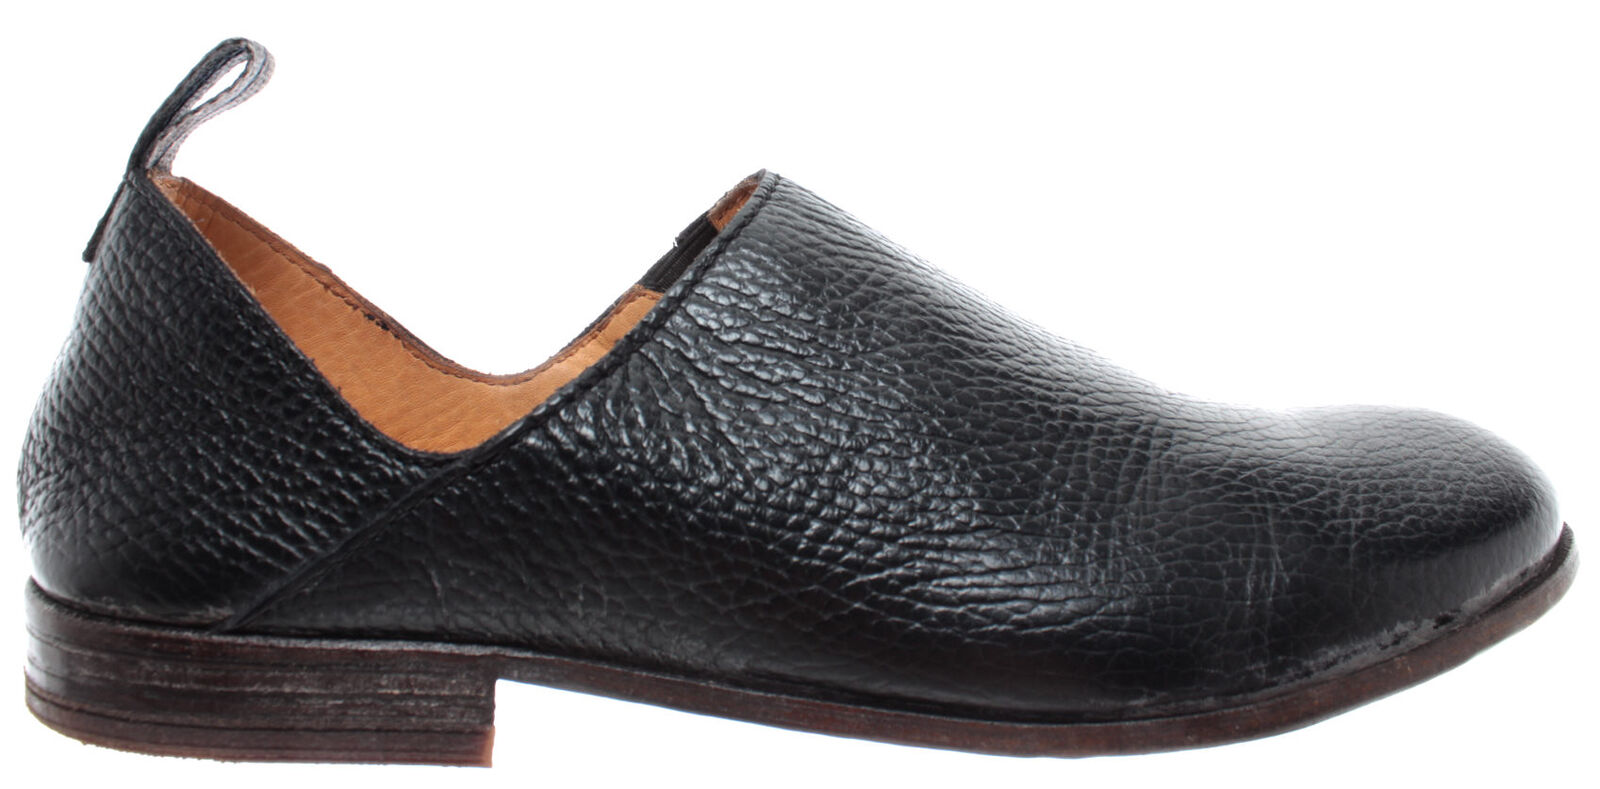 MOMA Chaussures Femmes Mocassin Enfiler 43802-Y1 Vitello noir Cuir Cuir Cuir Noir Made Italie 62fc12